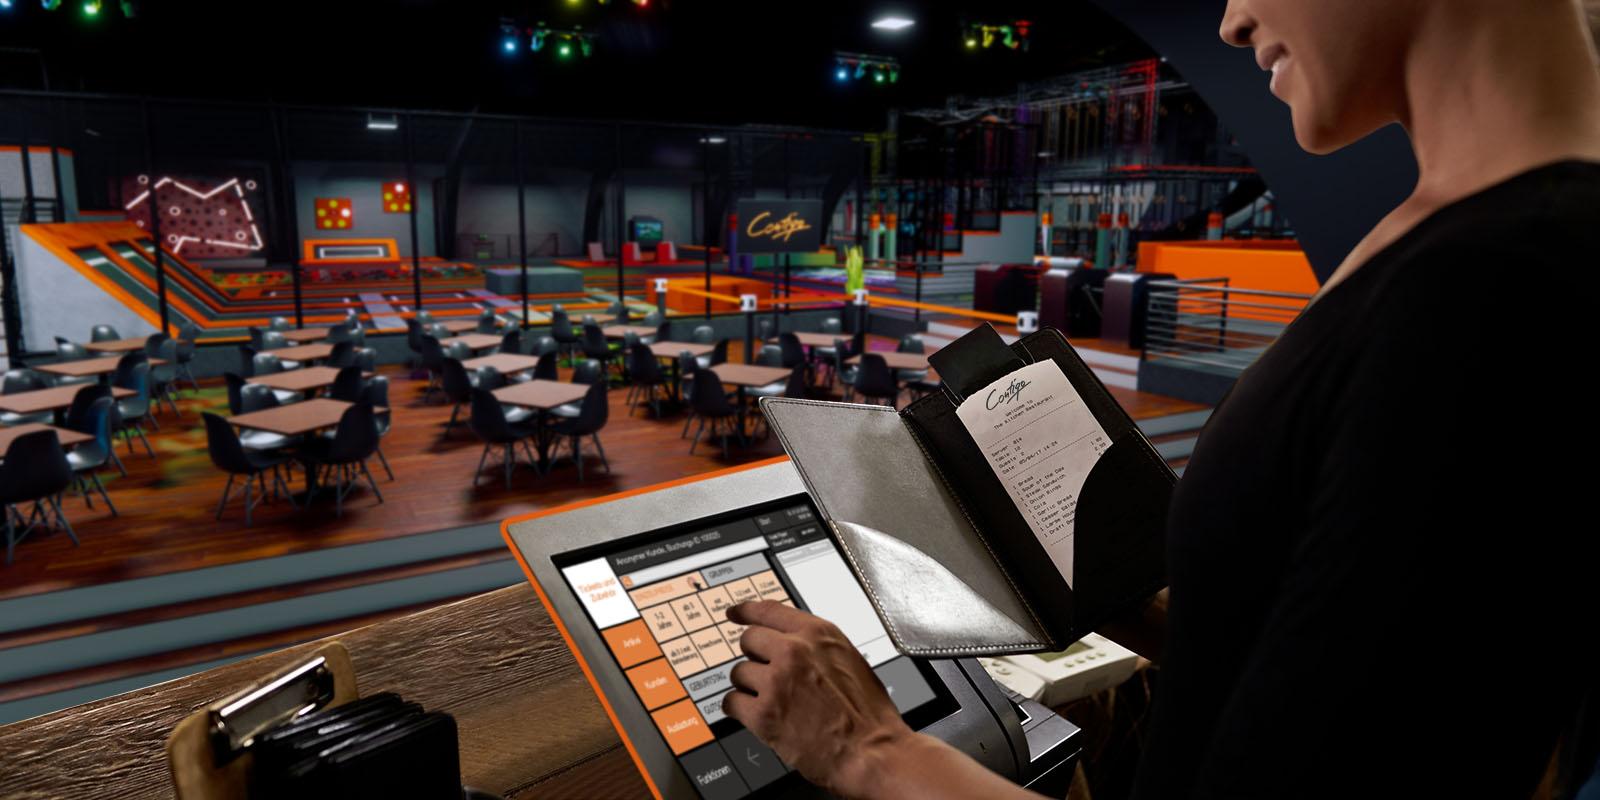 Kasse Indoorpark Indoorspielplatz Trampolinpark Contigo Indoortainment